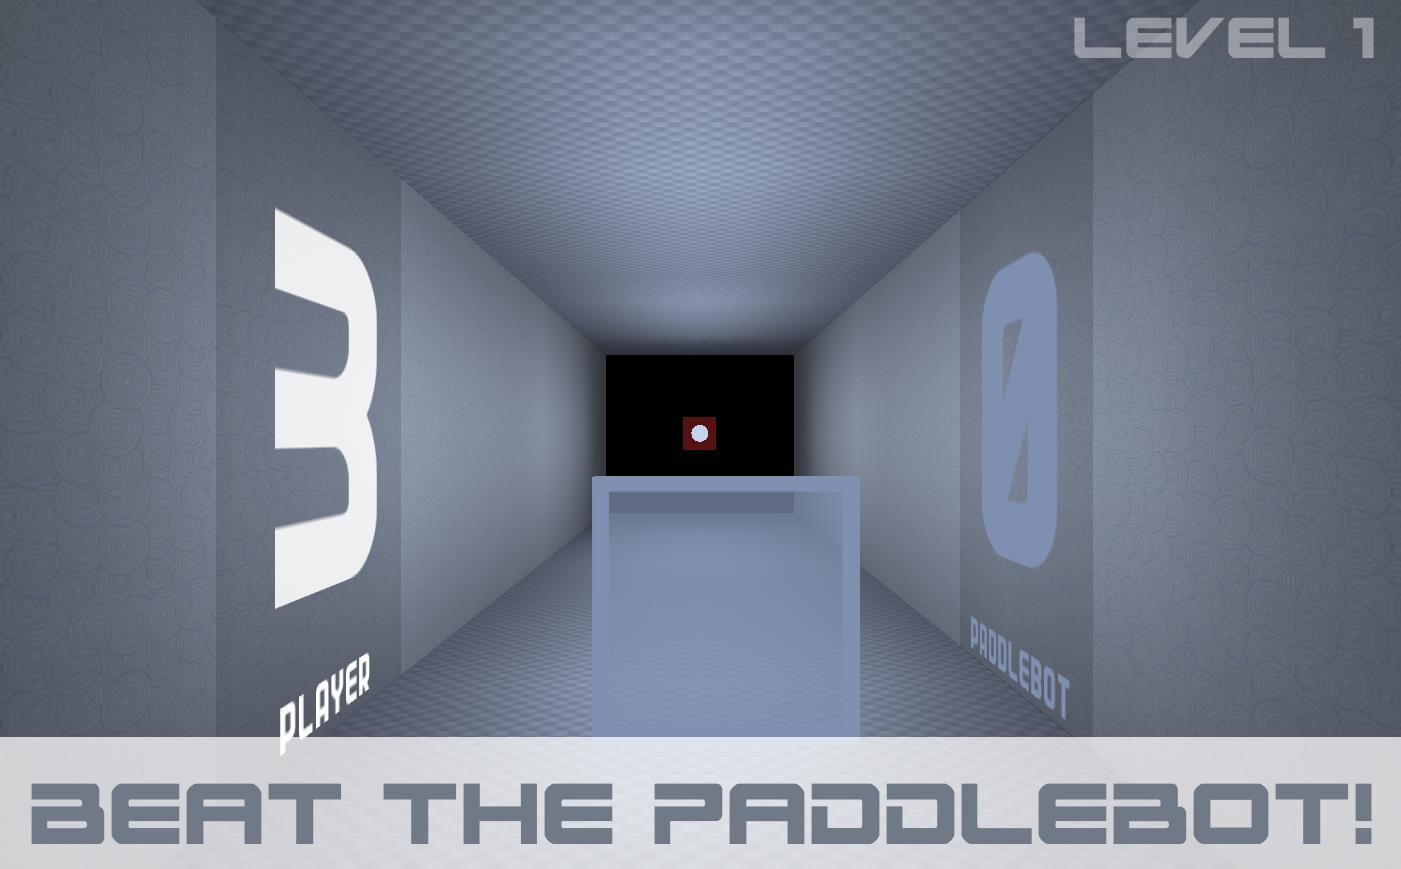 Paddlebot-BETA 13